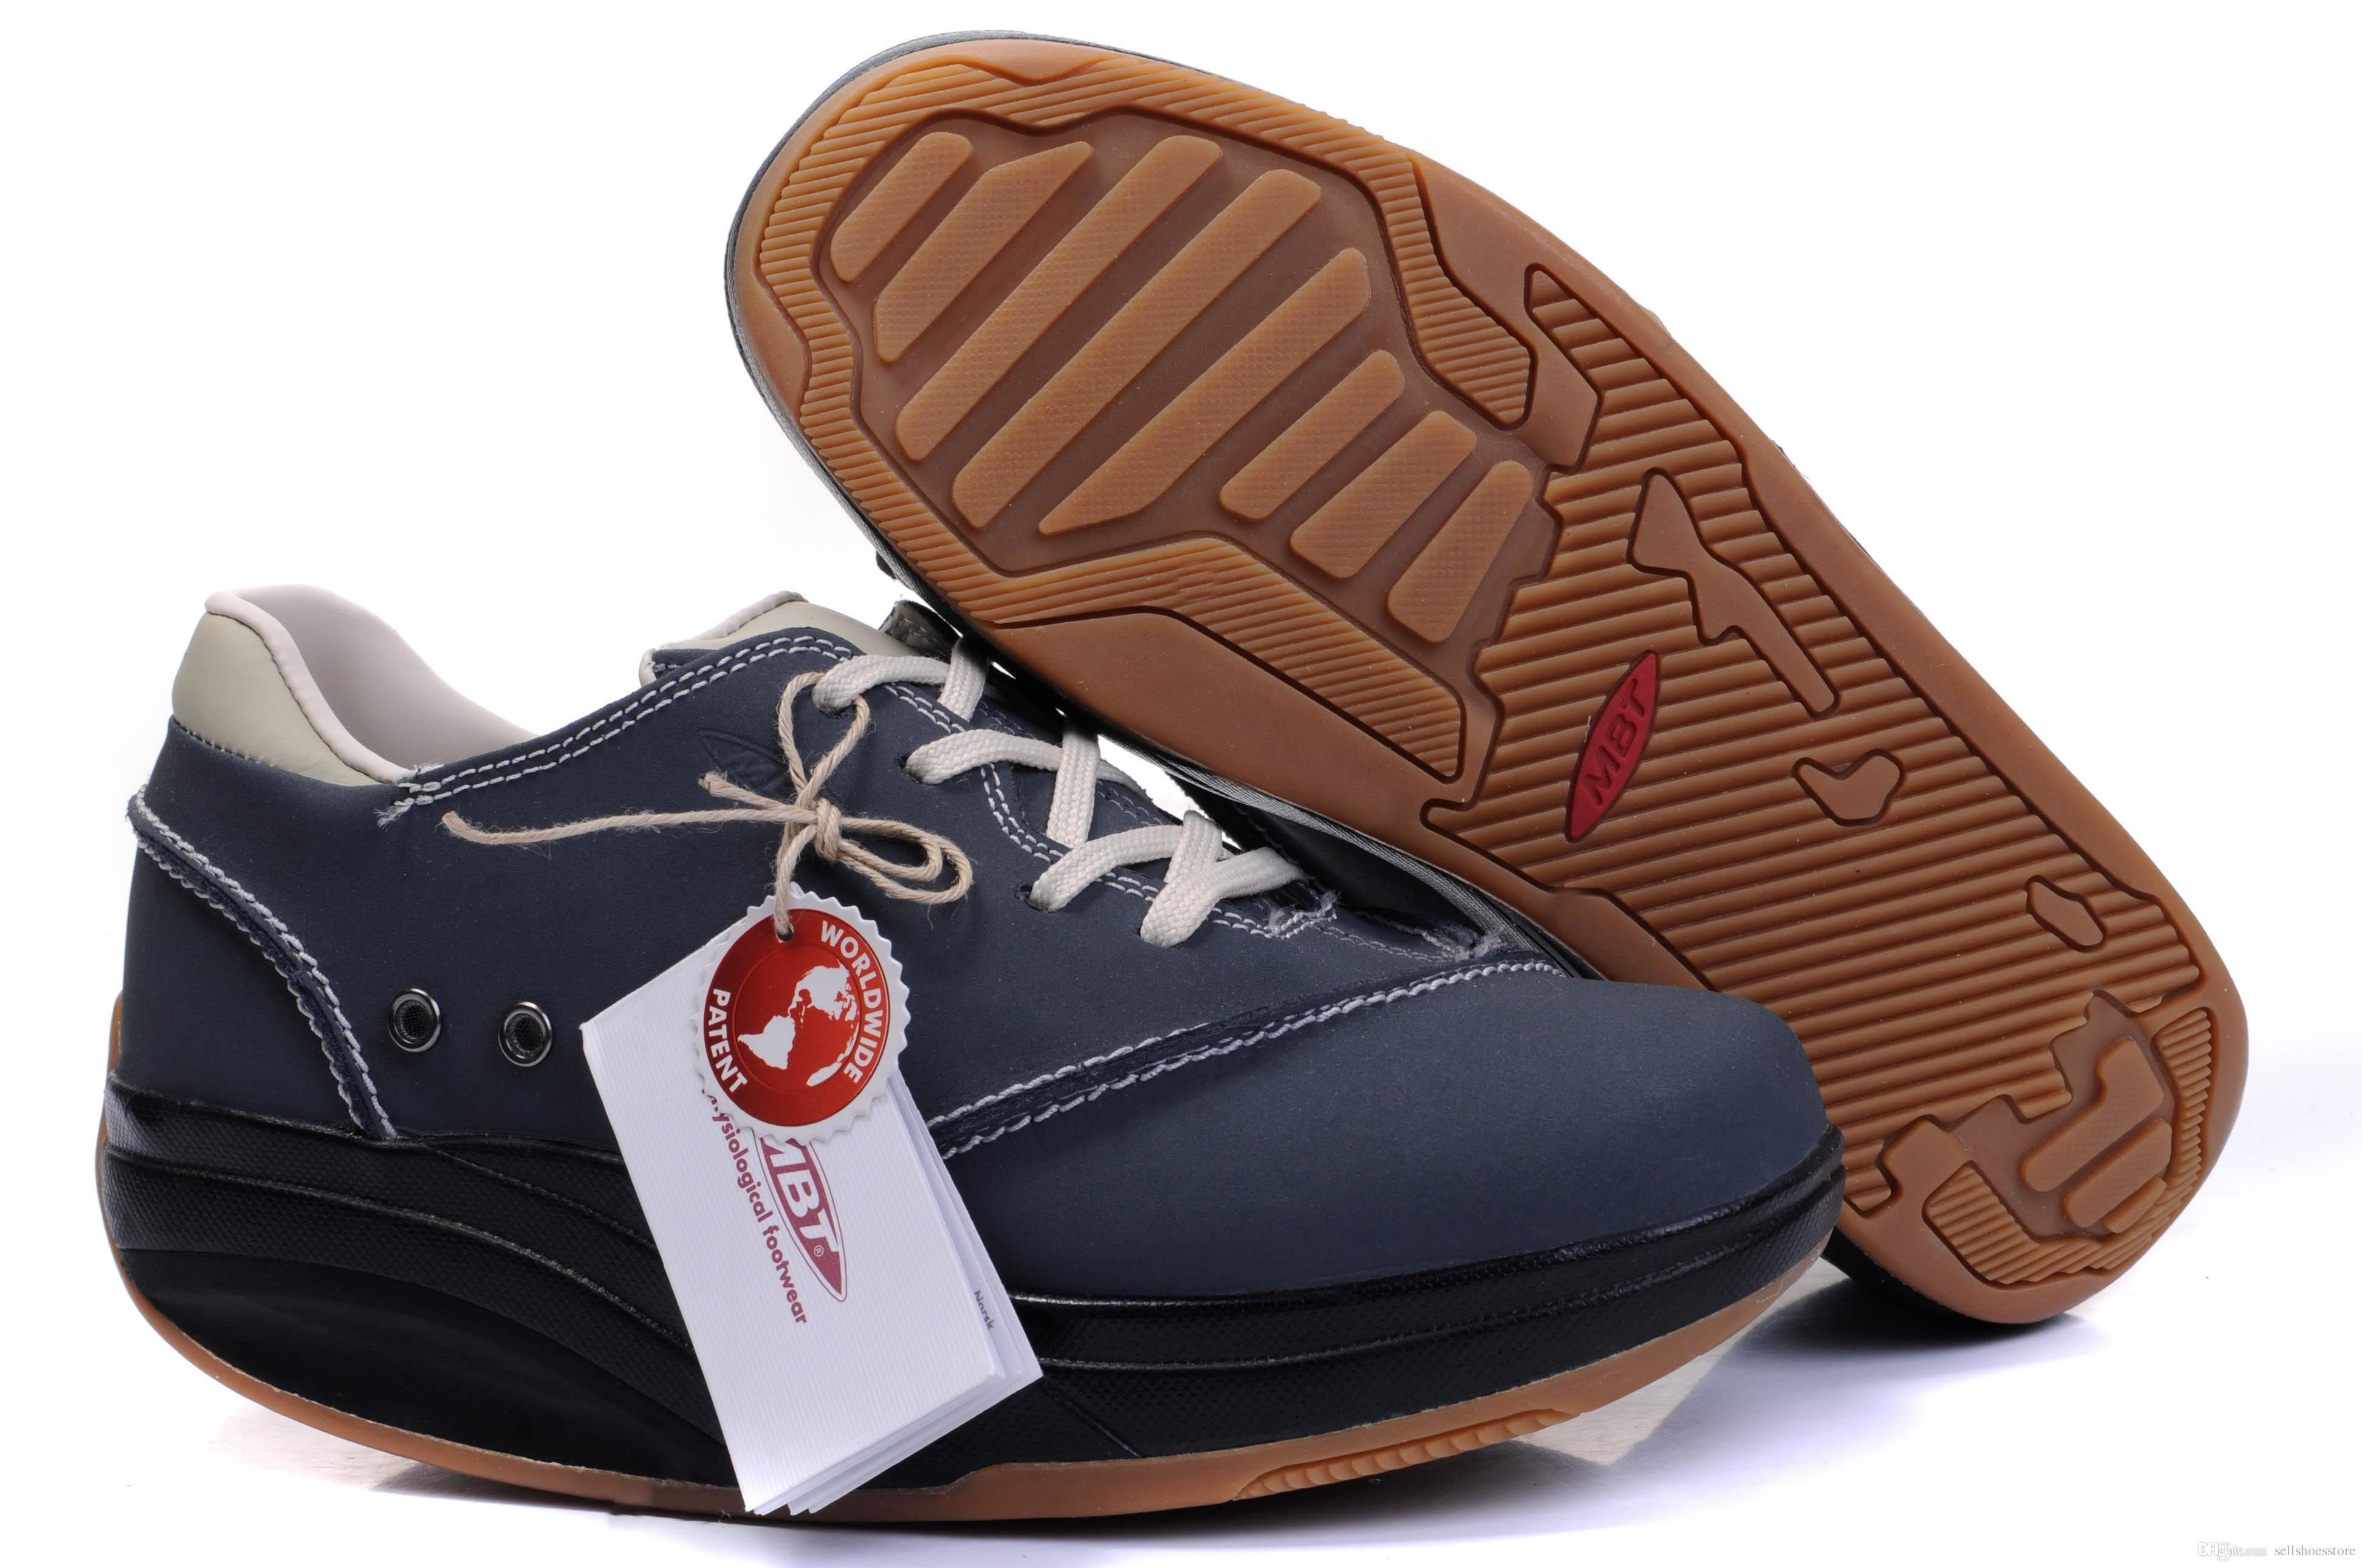 e0ed57d1dcaa Original Box Luxury Brand Men Women Barabara Stone Nubuck Leather Walking  Anti Shoes Sneaker Swing Shoes Hot Sale Best Athletic Shoes For Kids  Toddler Gym ...